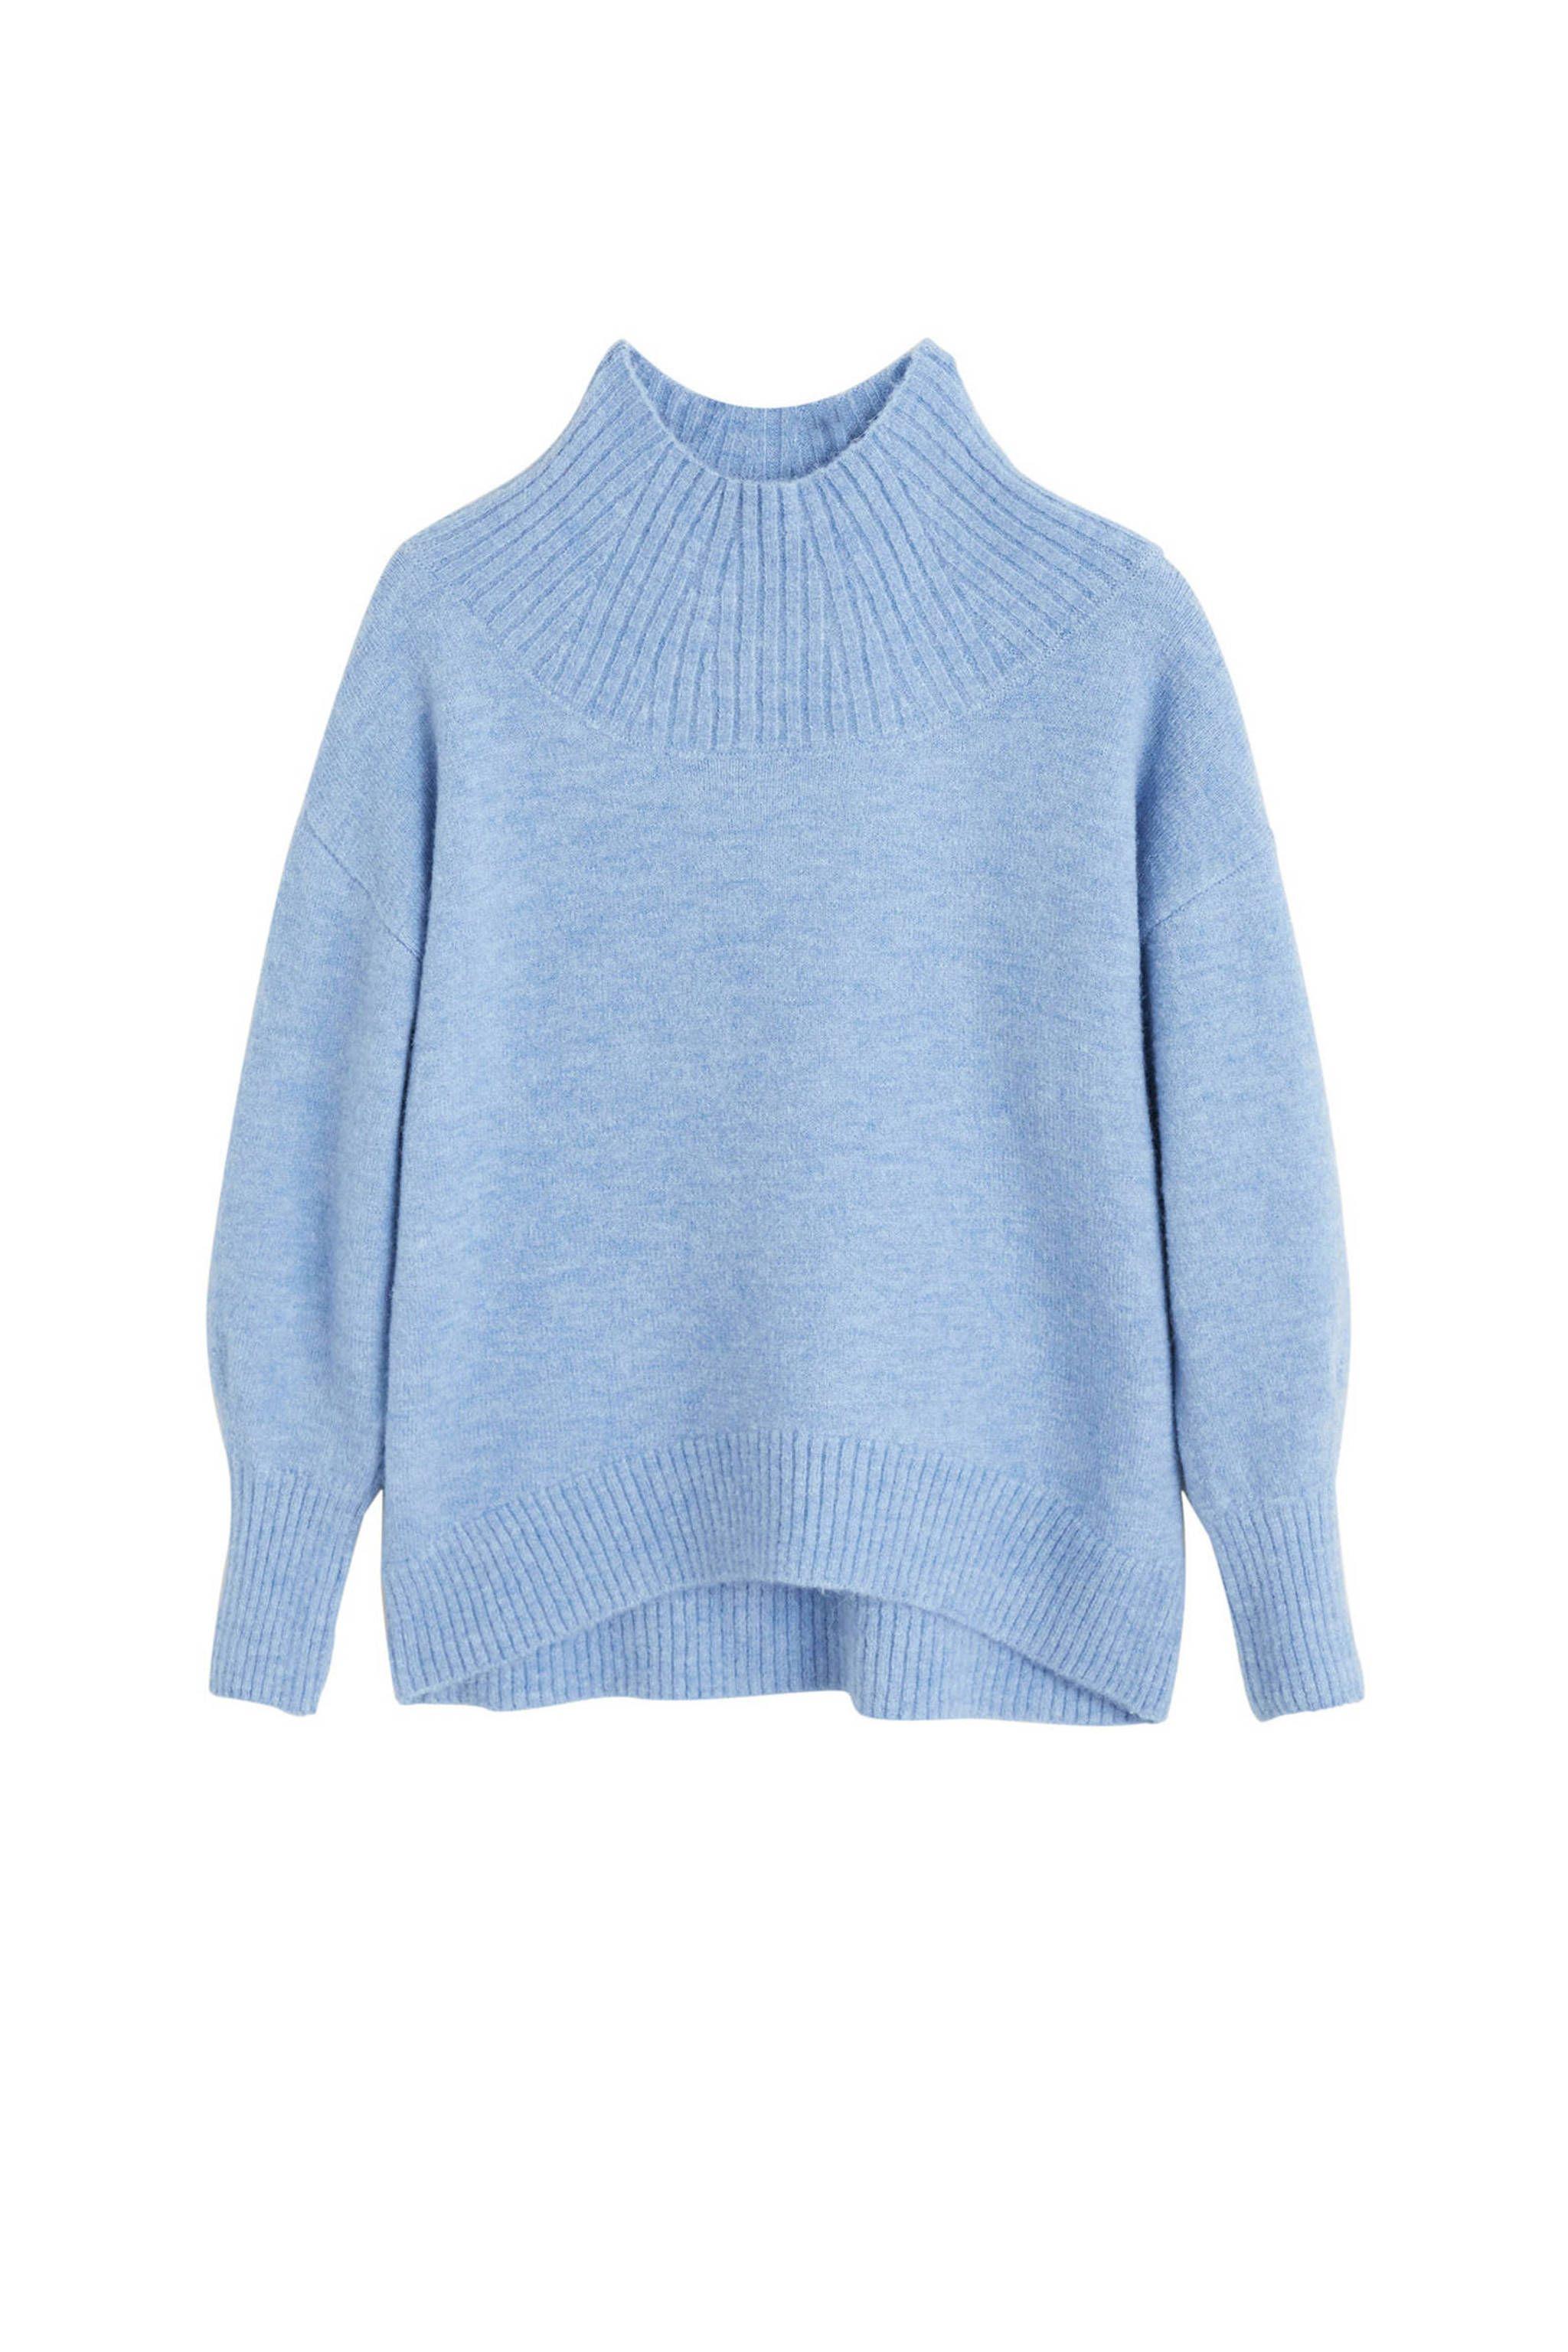 Mango Trui.Mango Trui Met Wol Blauw In 2019 Verlanglijst Sweaters Sweaters